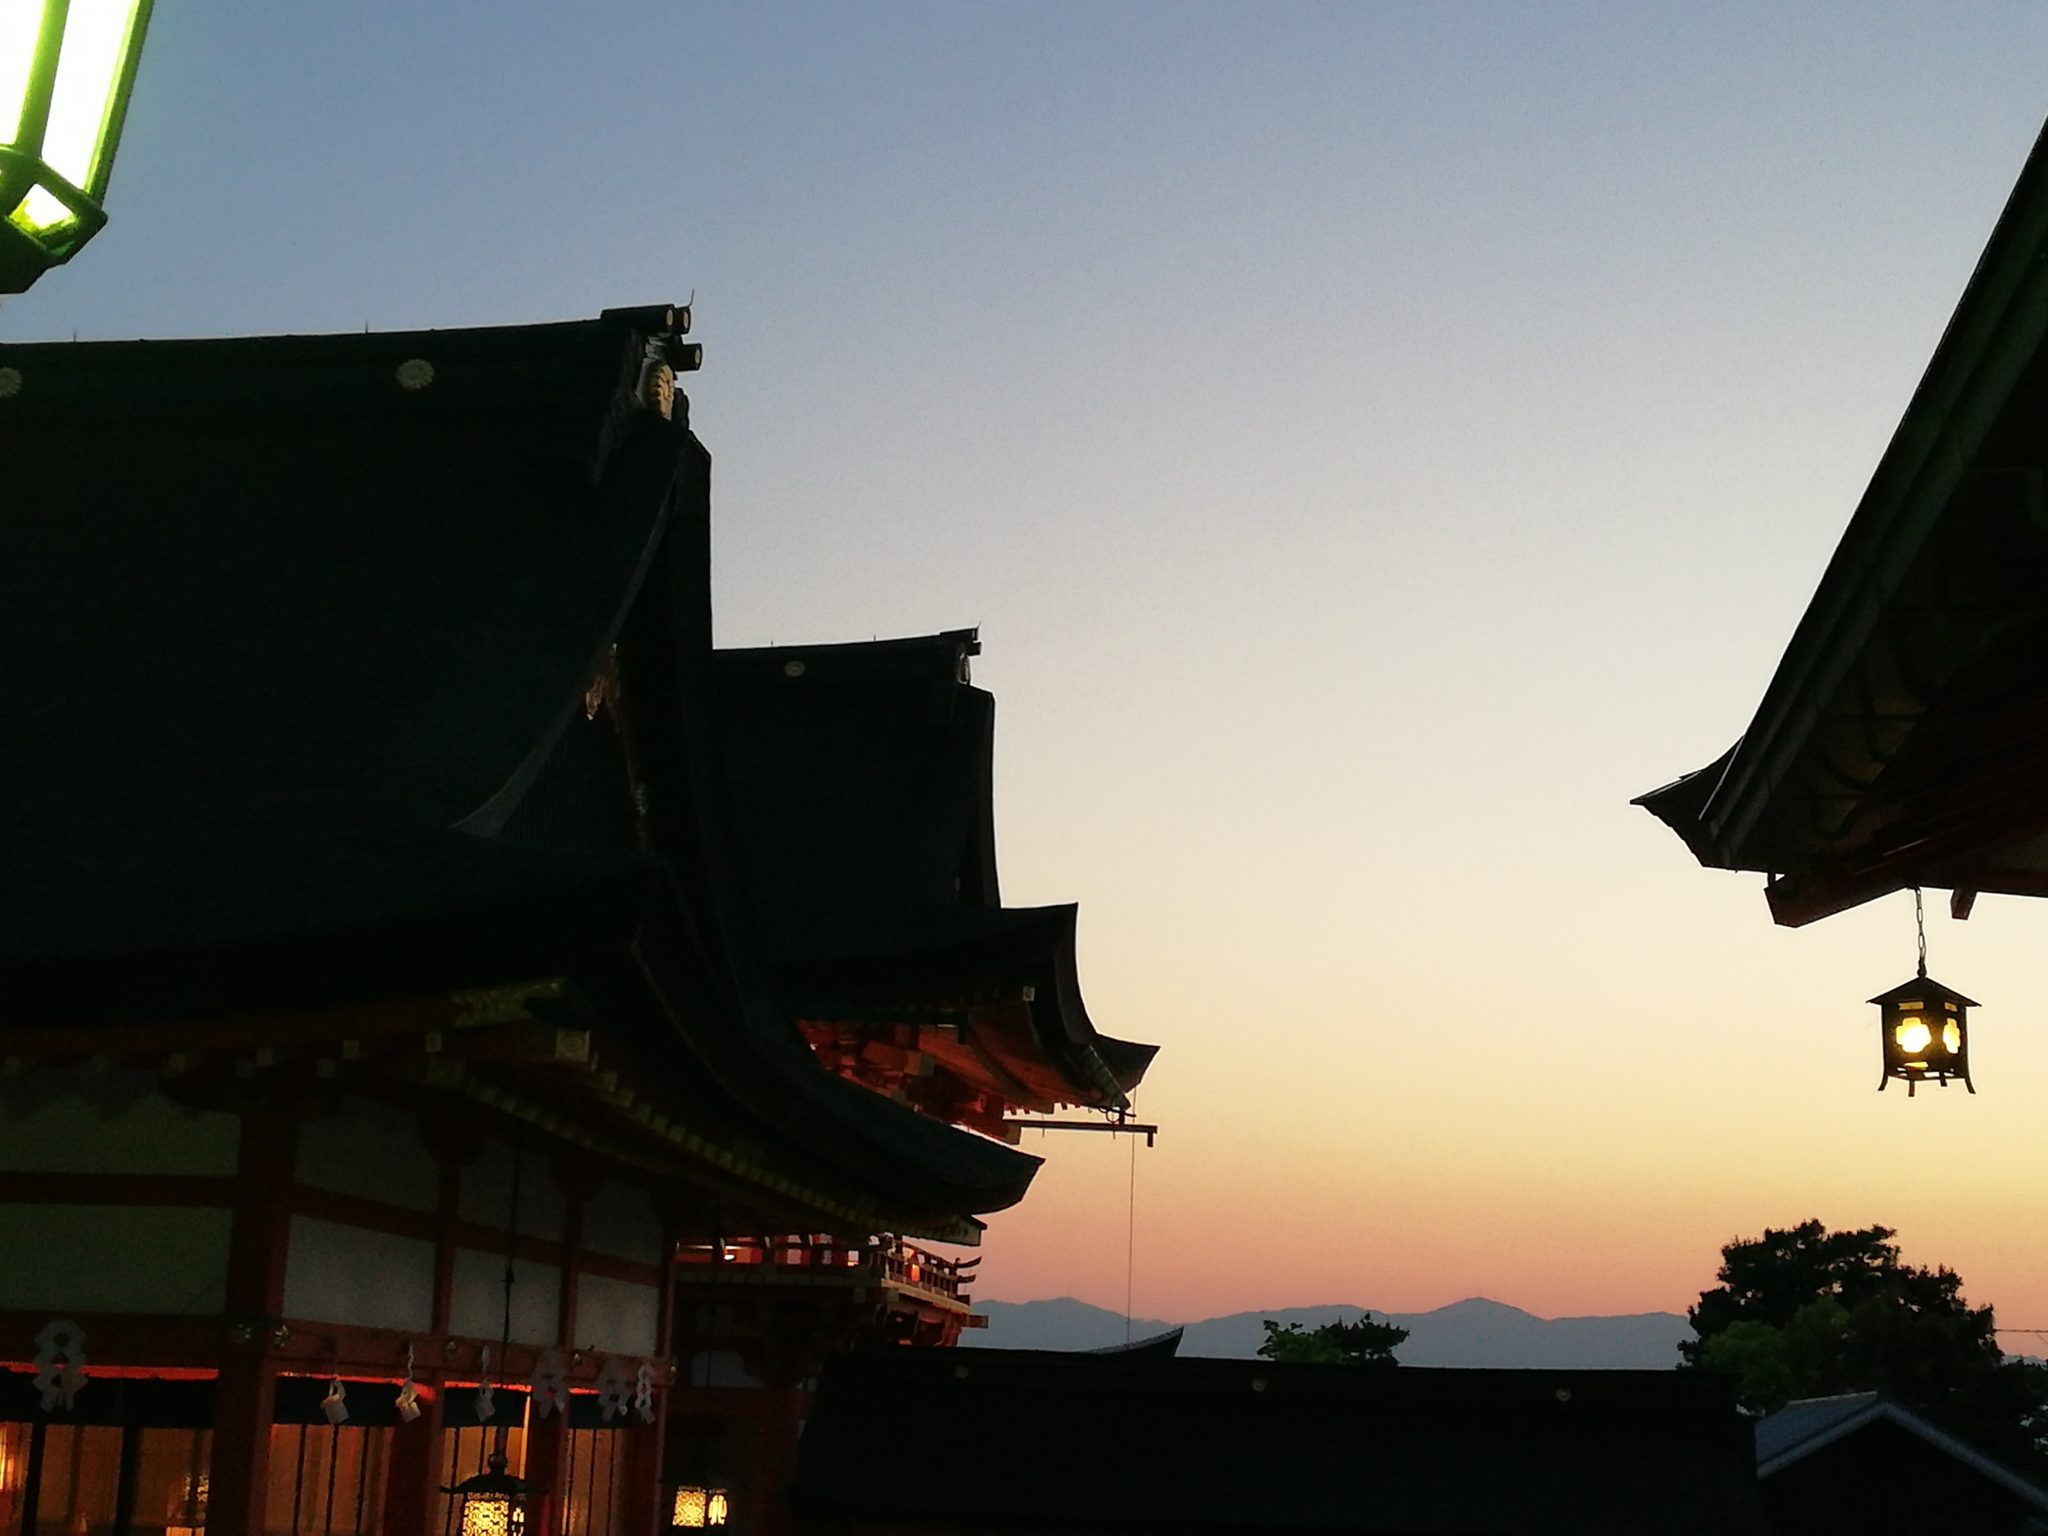 Mon voyage à Kyoto